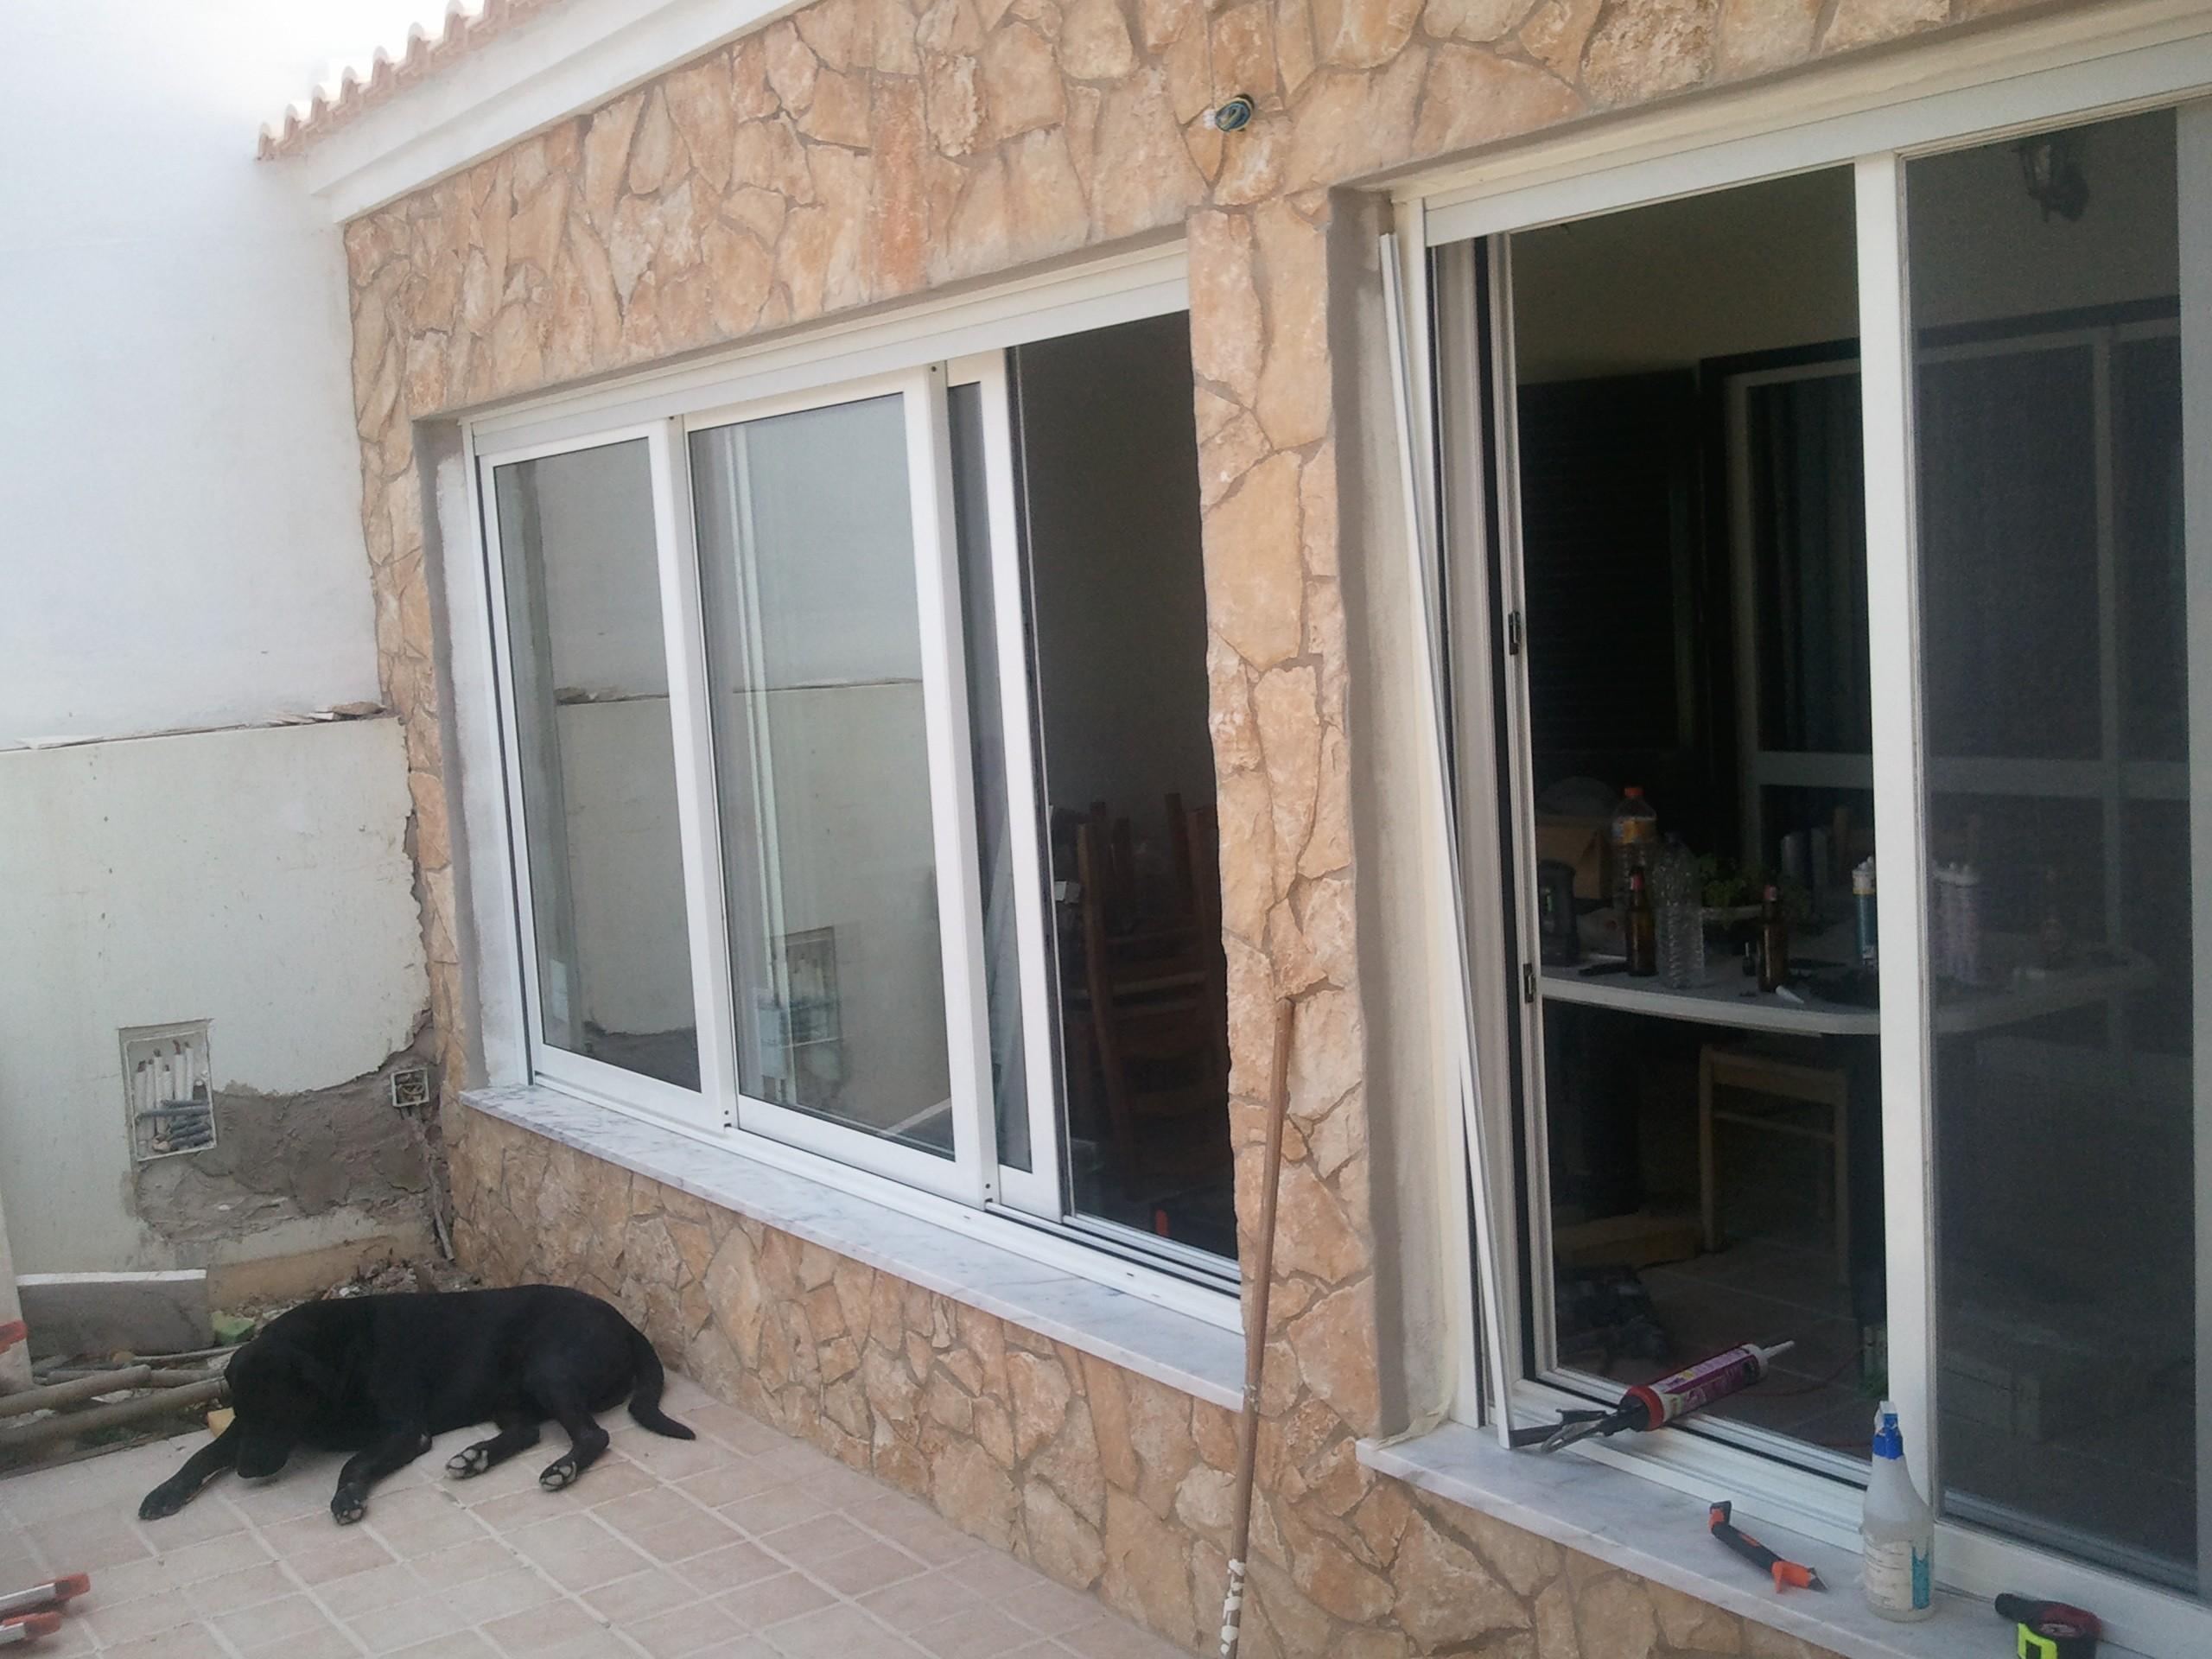 #80634C janela de aluminio com vidro 11 to download janela de aluminio com  186 Janelas De Vidro Na Sala